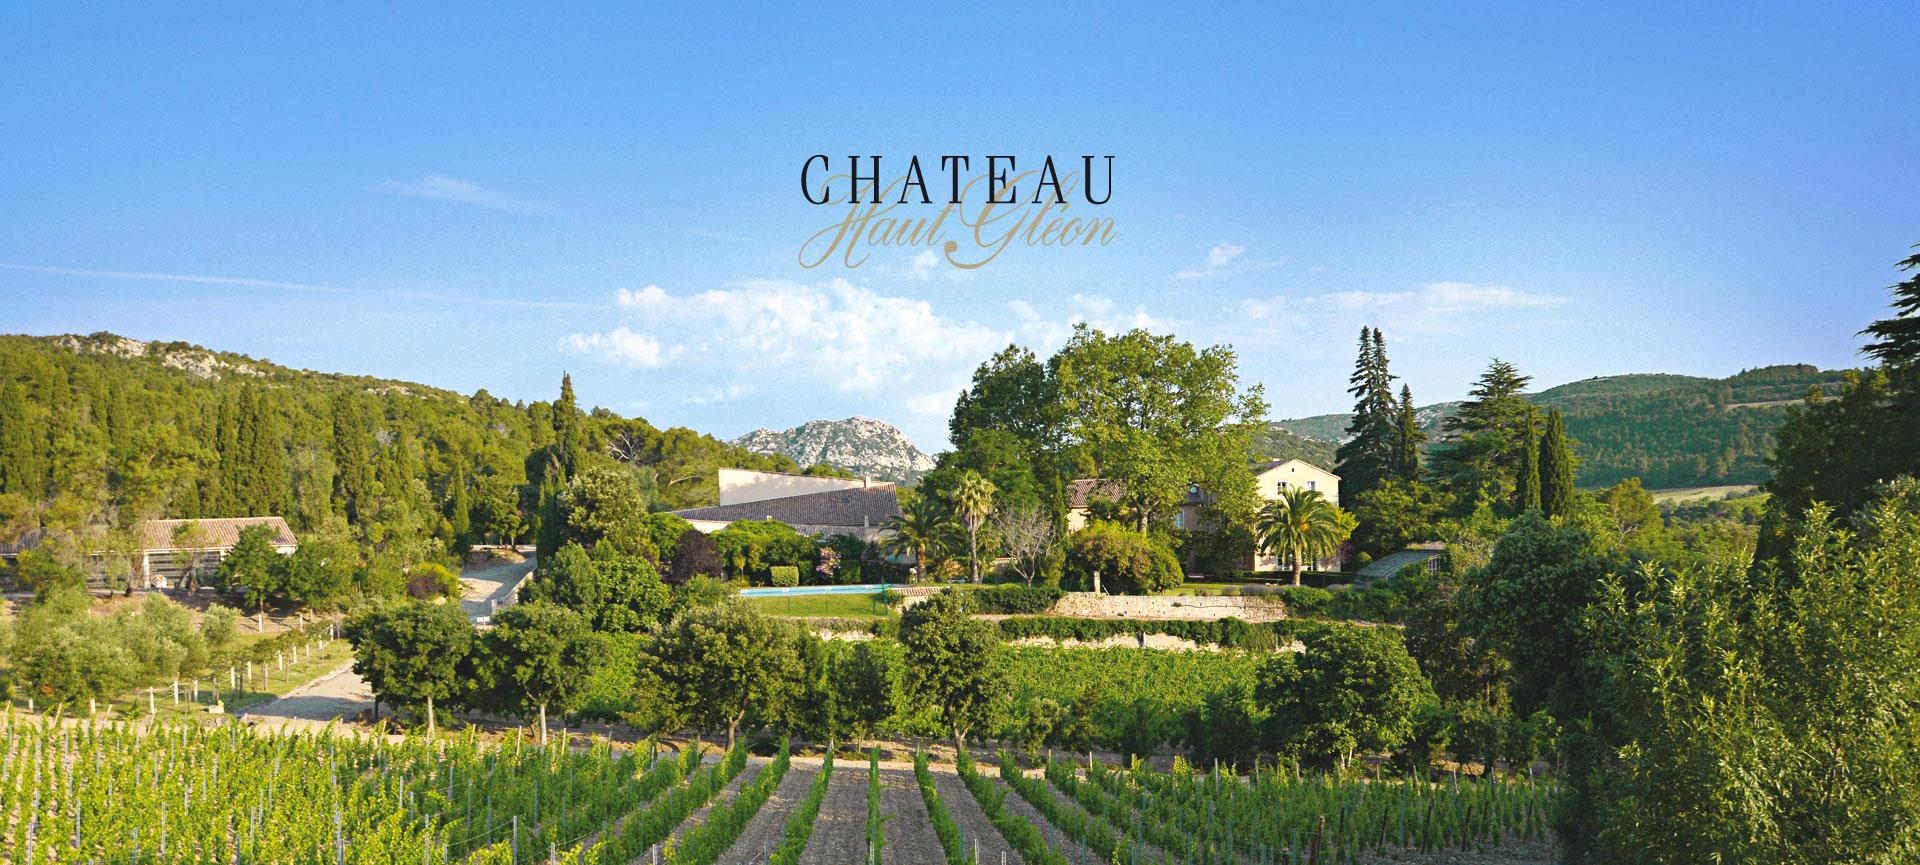 Château Haut Gléon